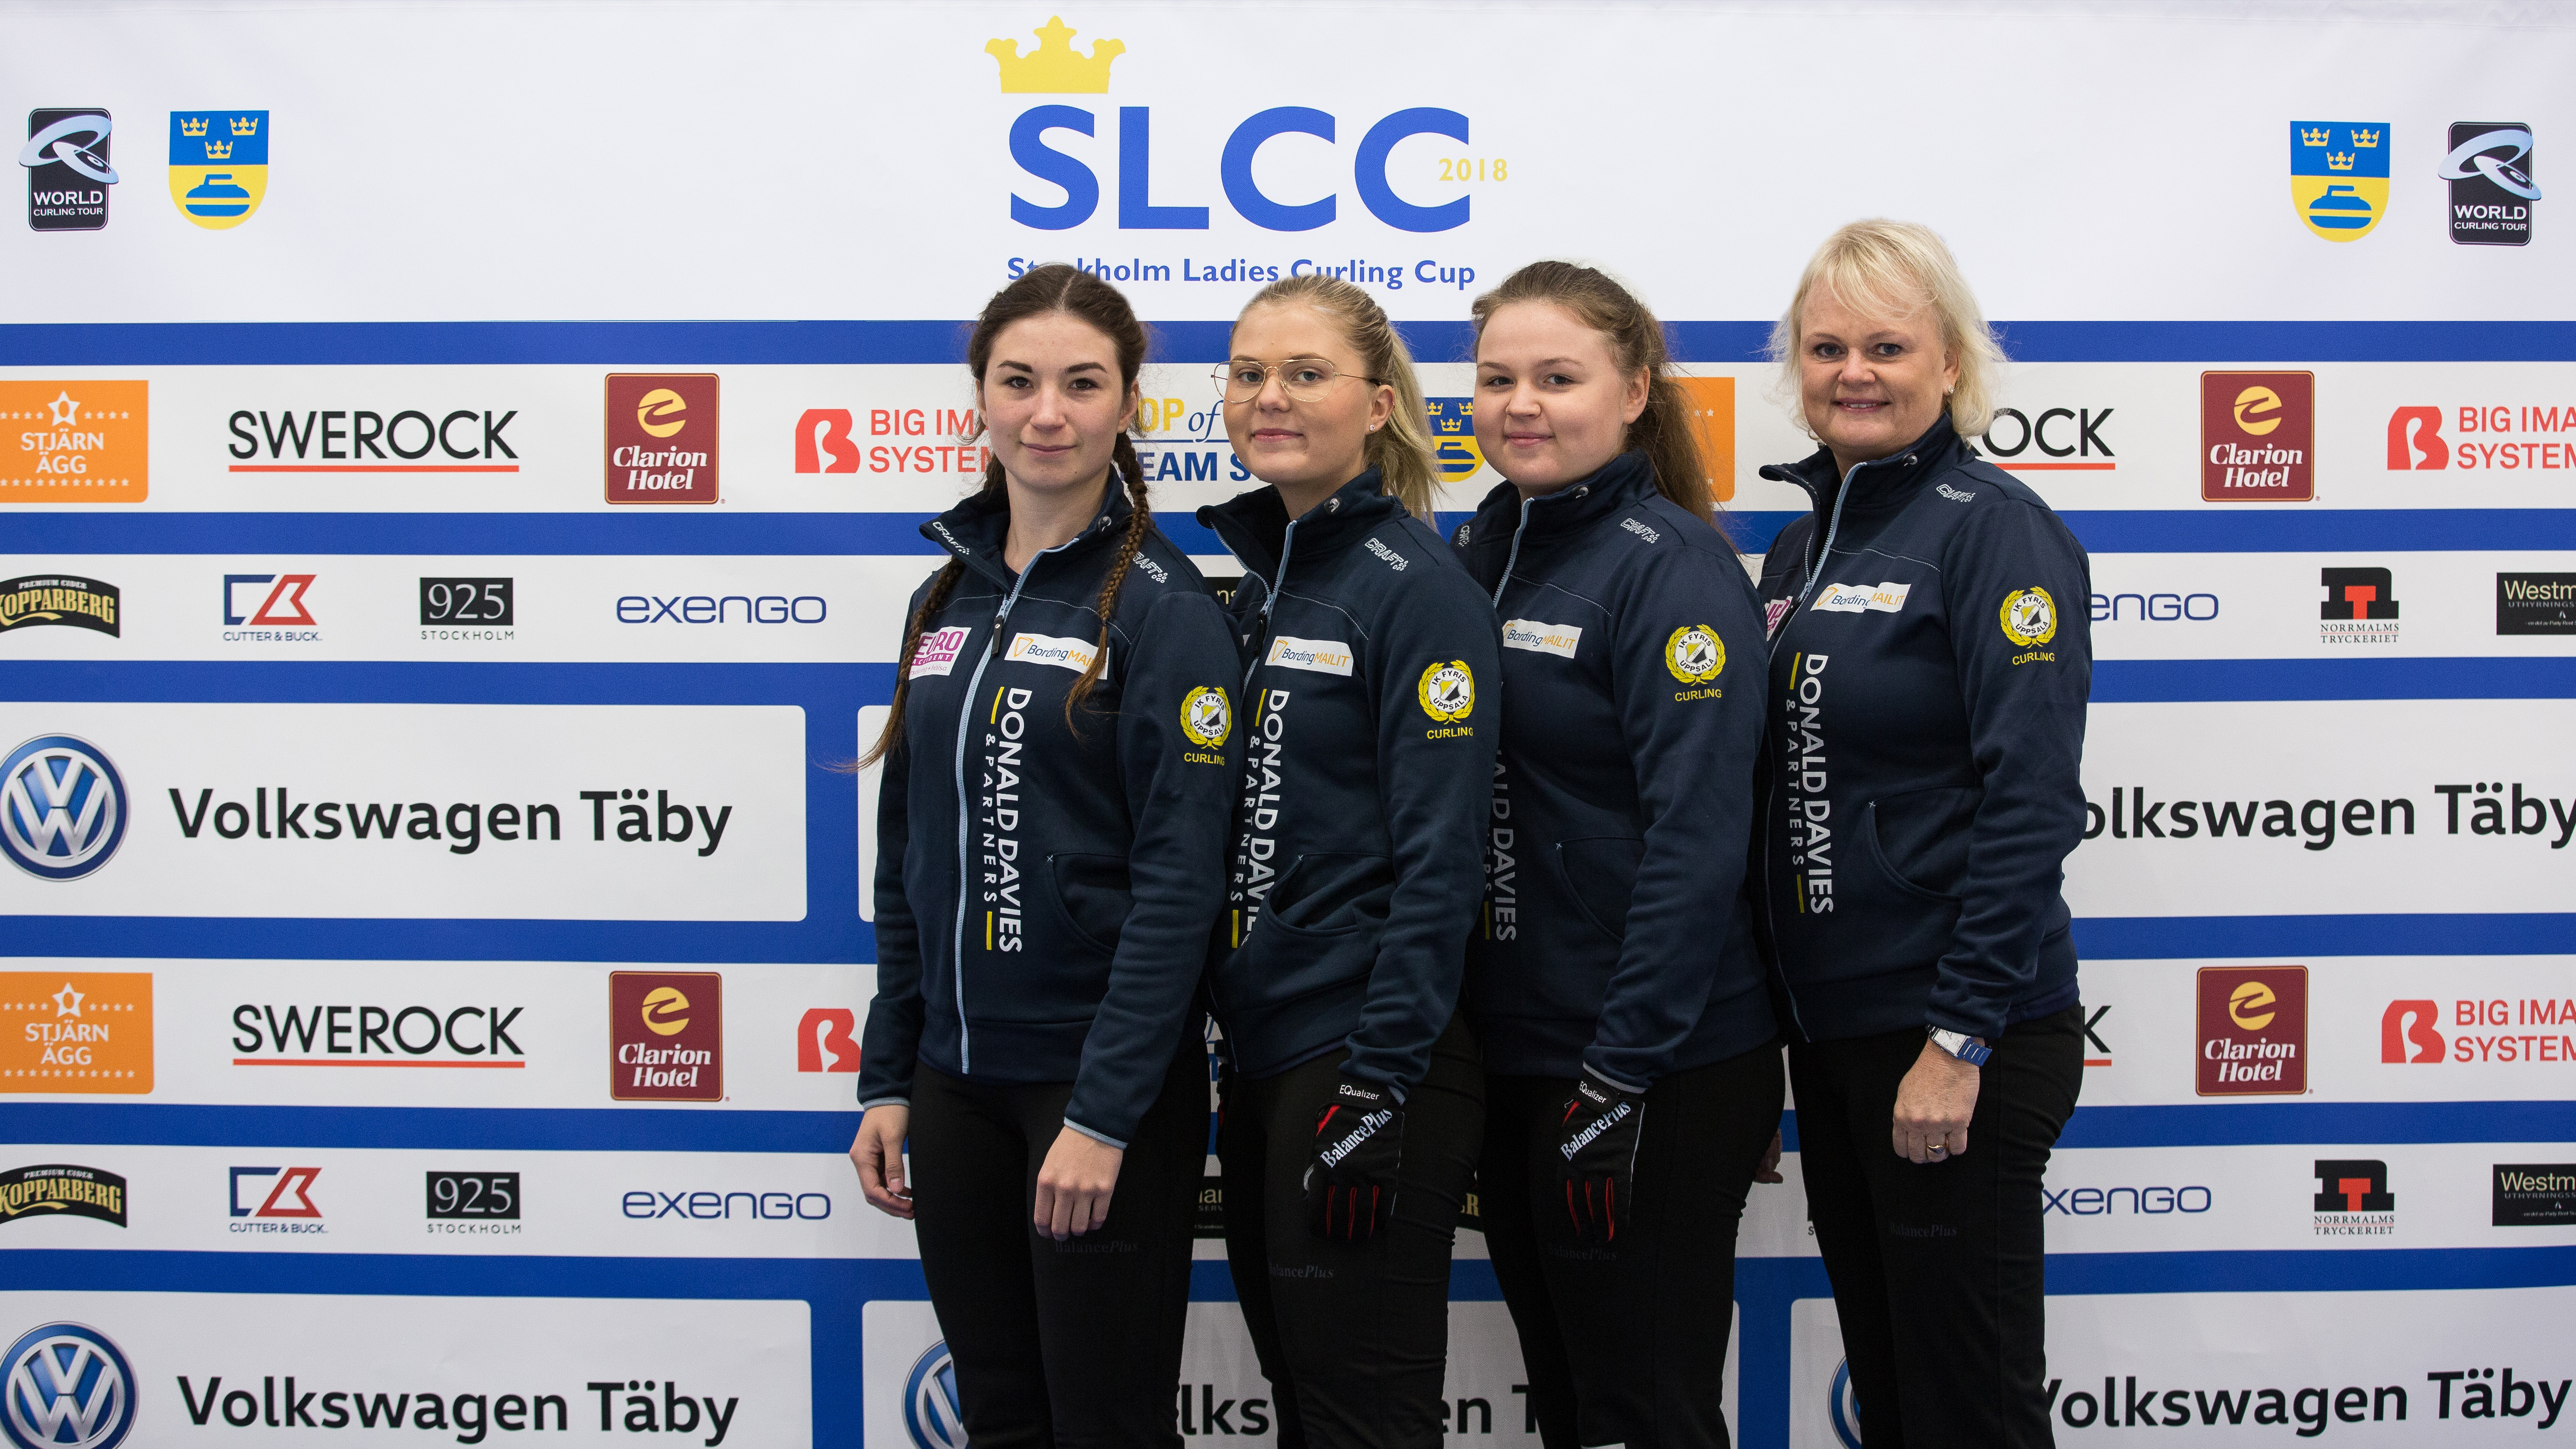 Team Norberg